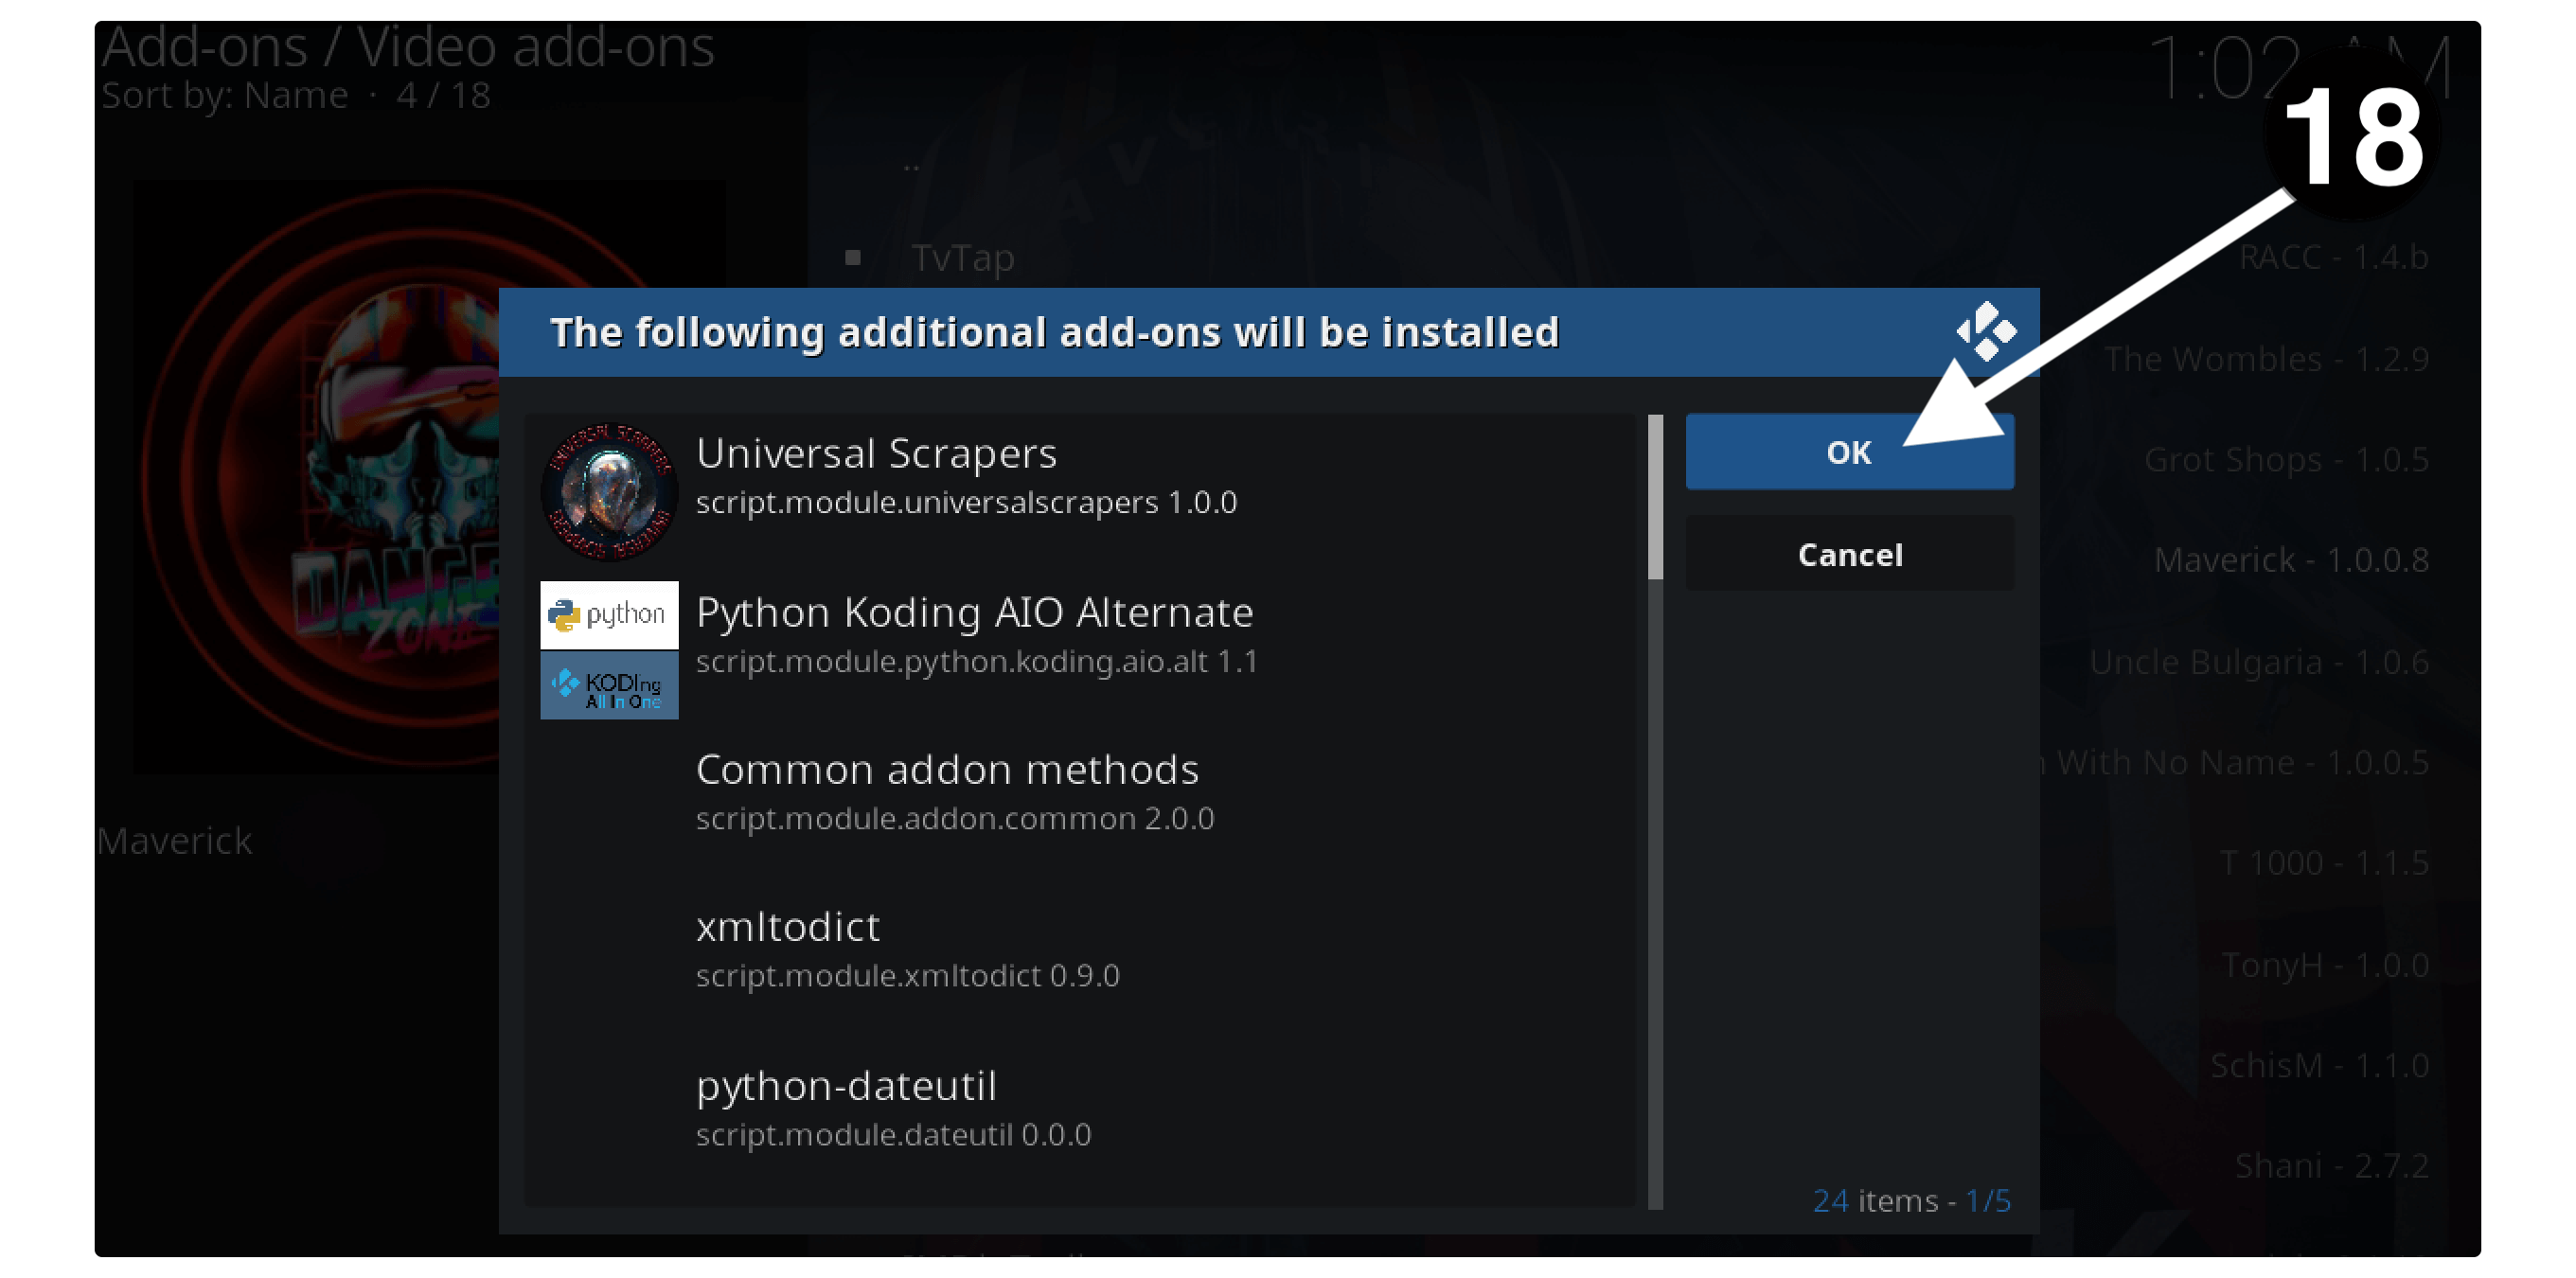 How-To-Download-Maverick-TV-Addon